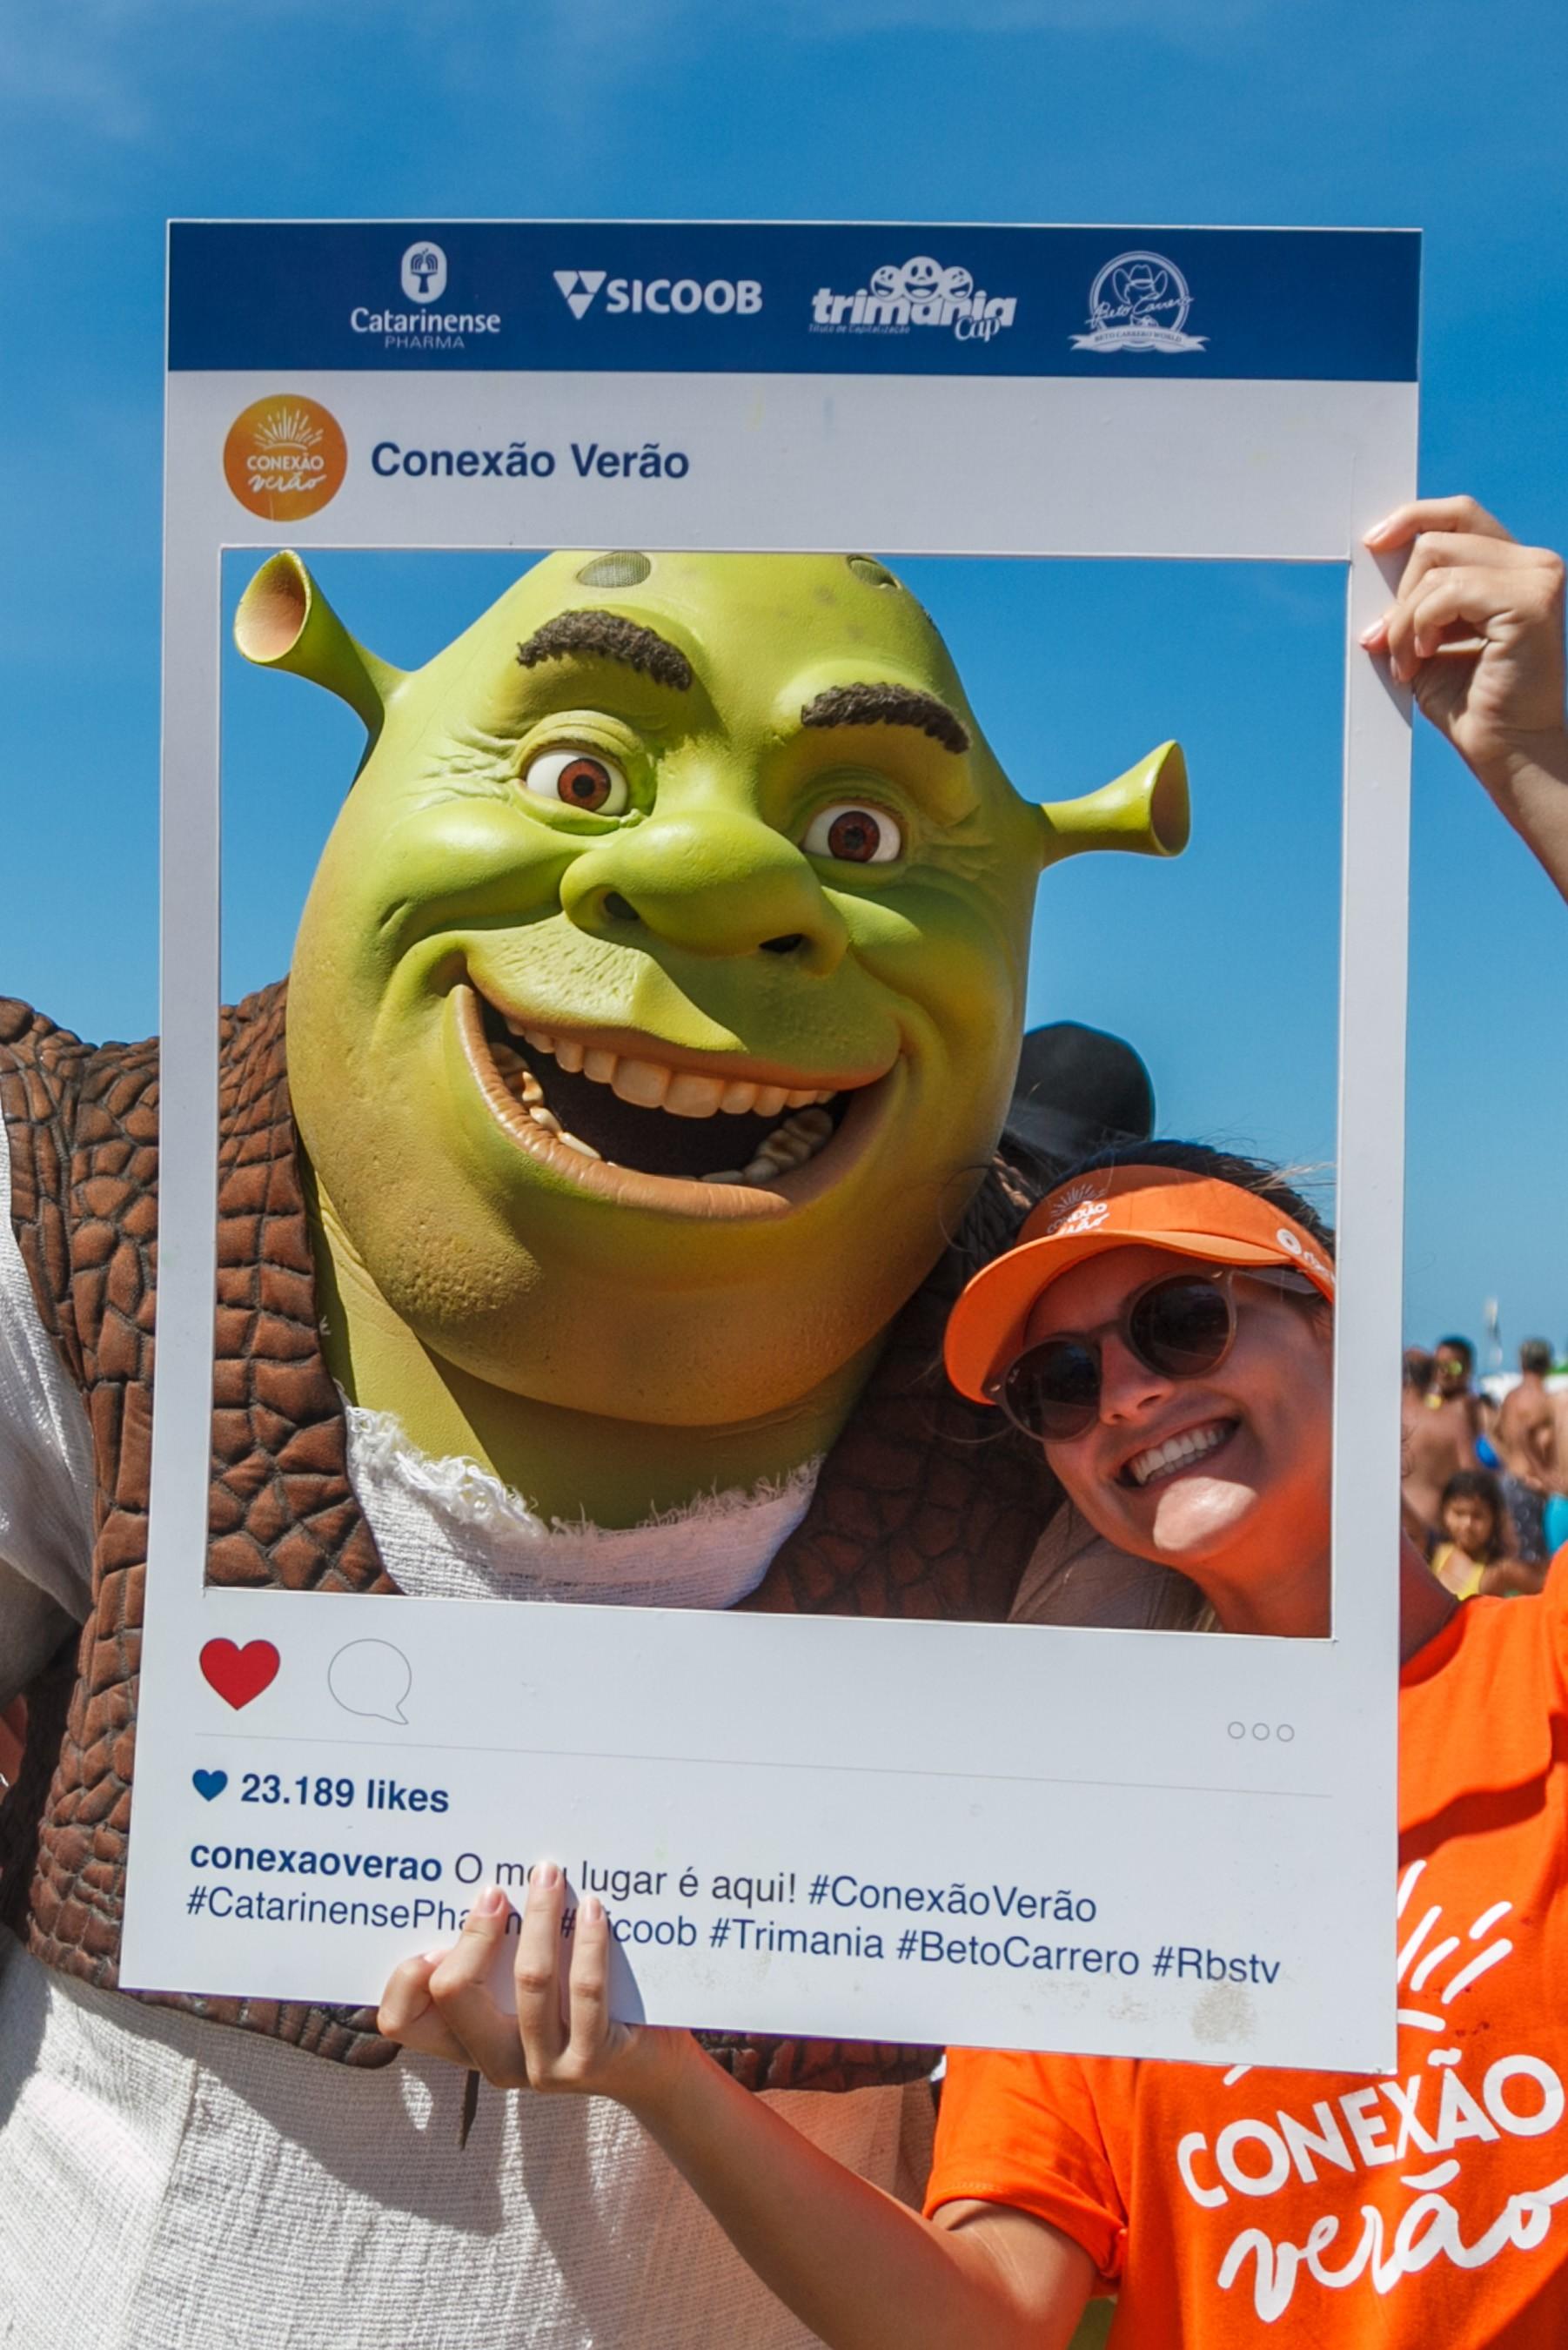 Personagem Shrek também estará em Piçarras (Foto: José Luiz Somensi/Divulgação)